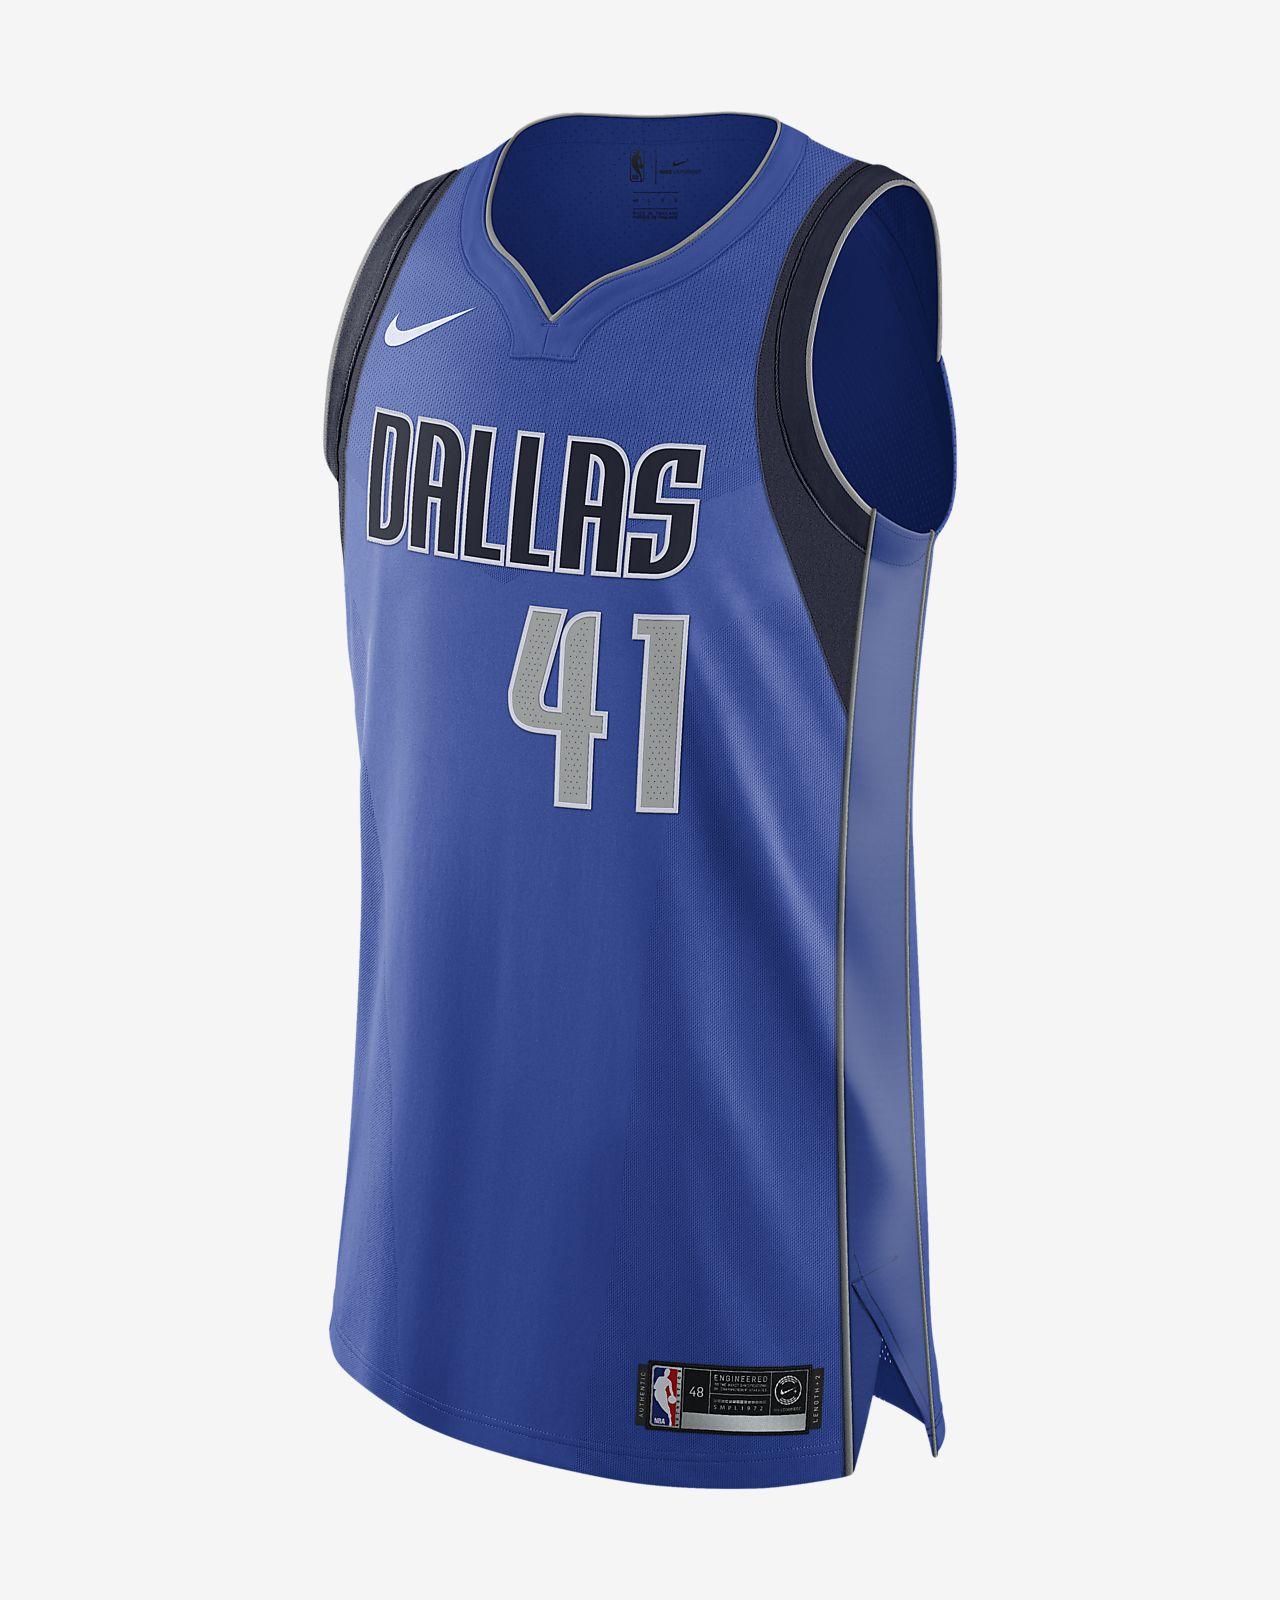 Men s Nike NBA Connected Jersey. Dirk Nowitzki Icon Edition Authentic (Dallas  Mavericks) 55f3d9767